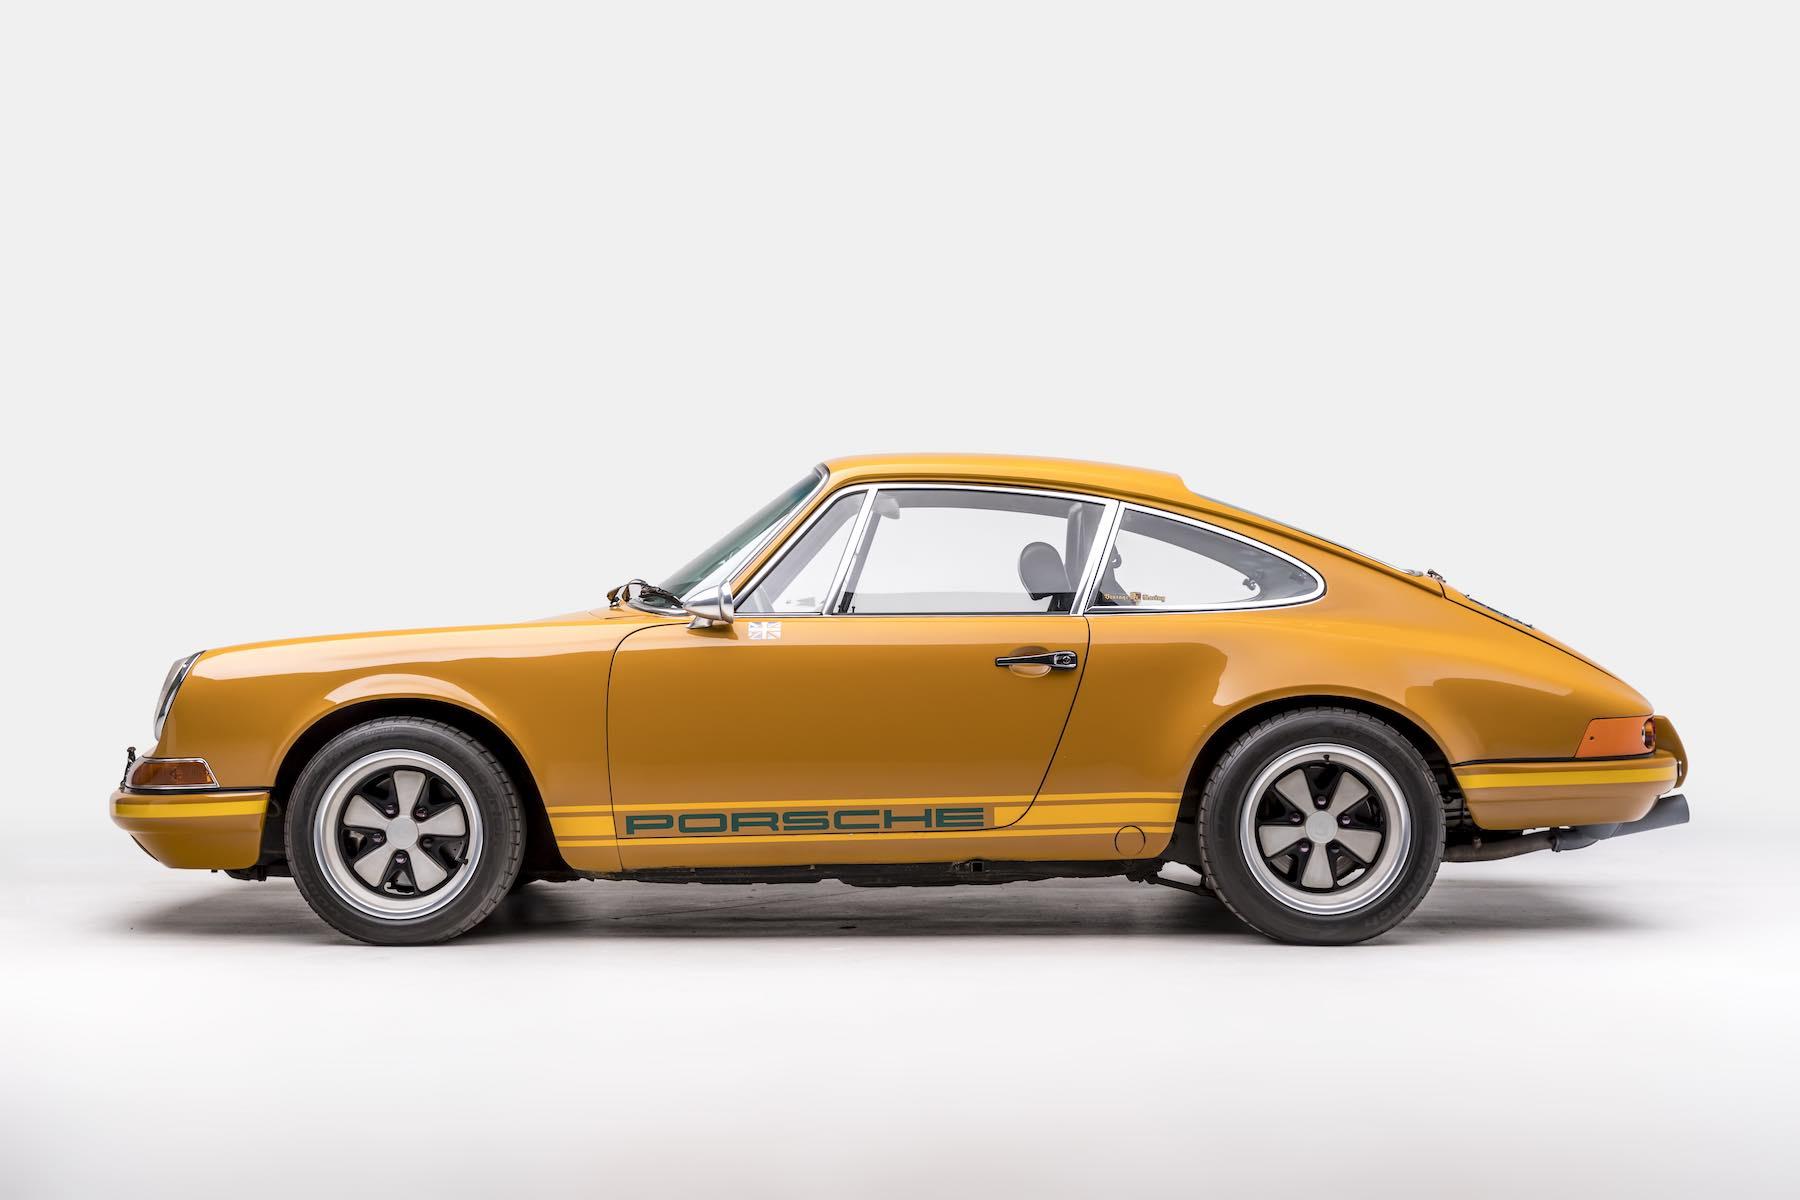 Rob Dickinson Singer Vehicle Design - 1969 911E first car - 11